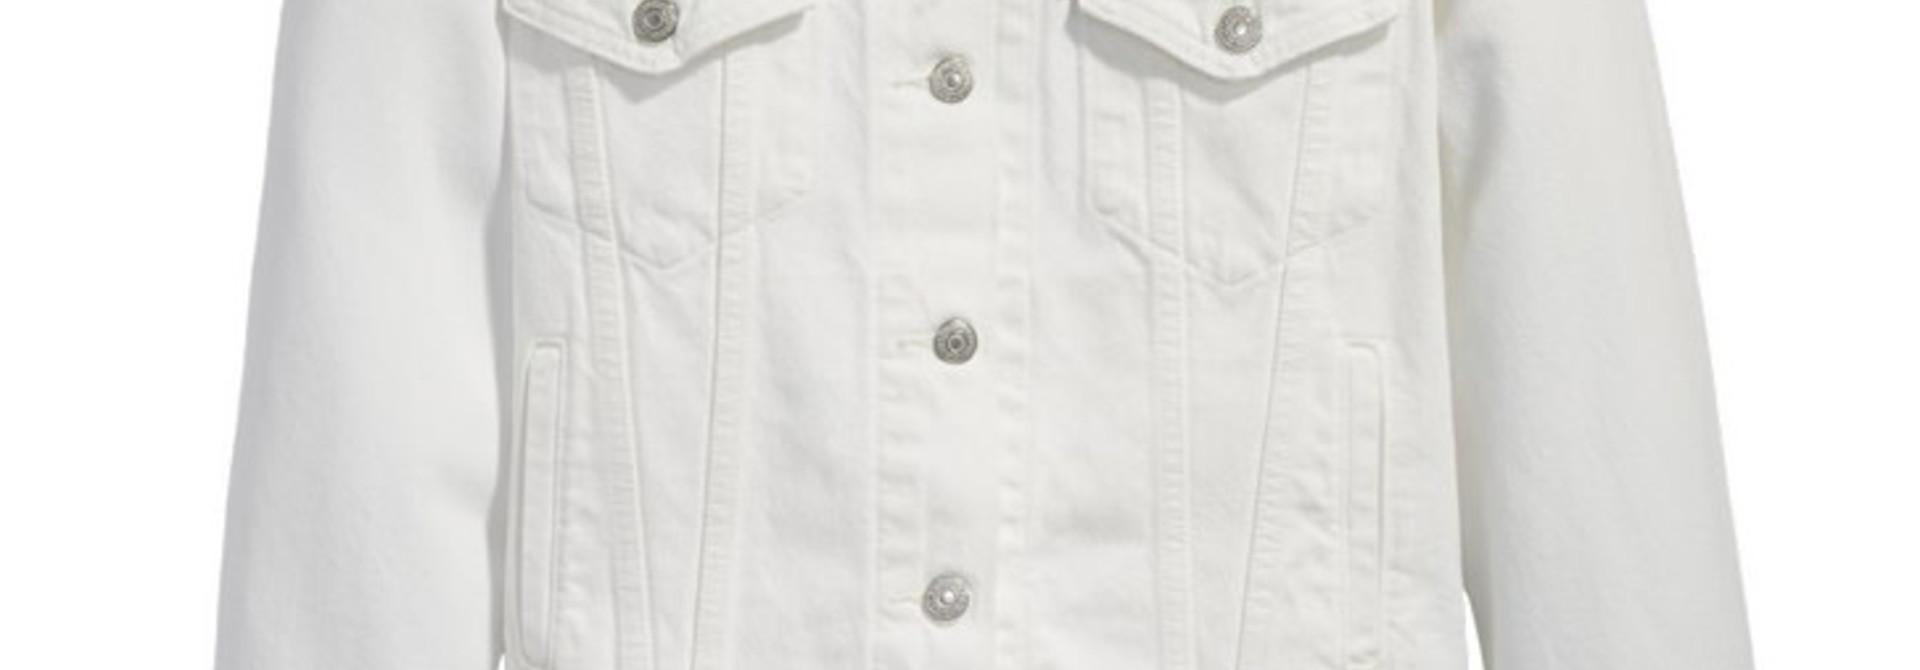 LEVI'S EX BF TRUCKER 29944-00896 WHITE CELL